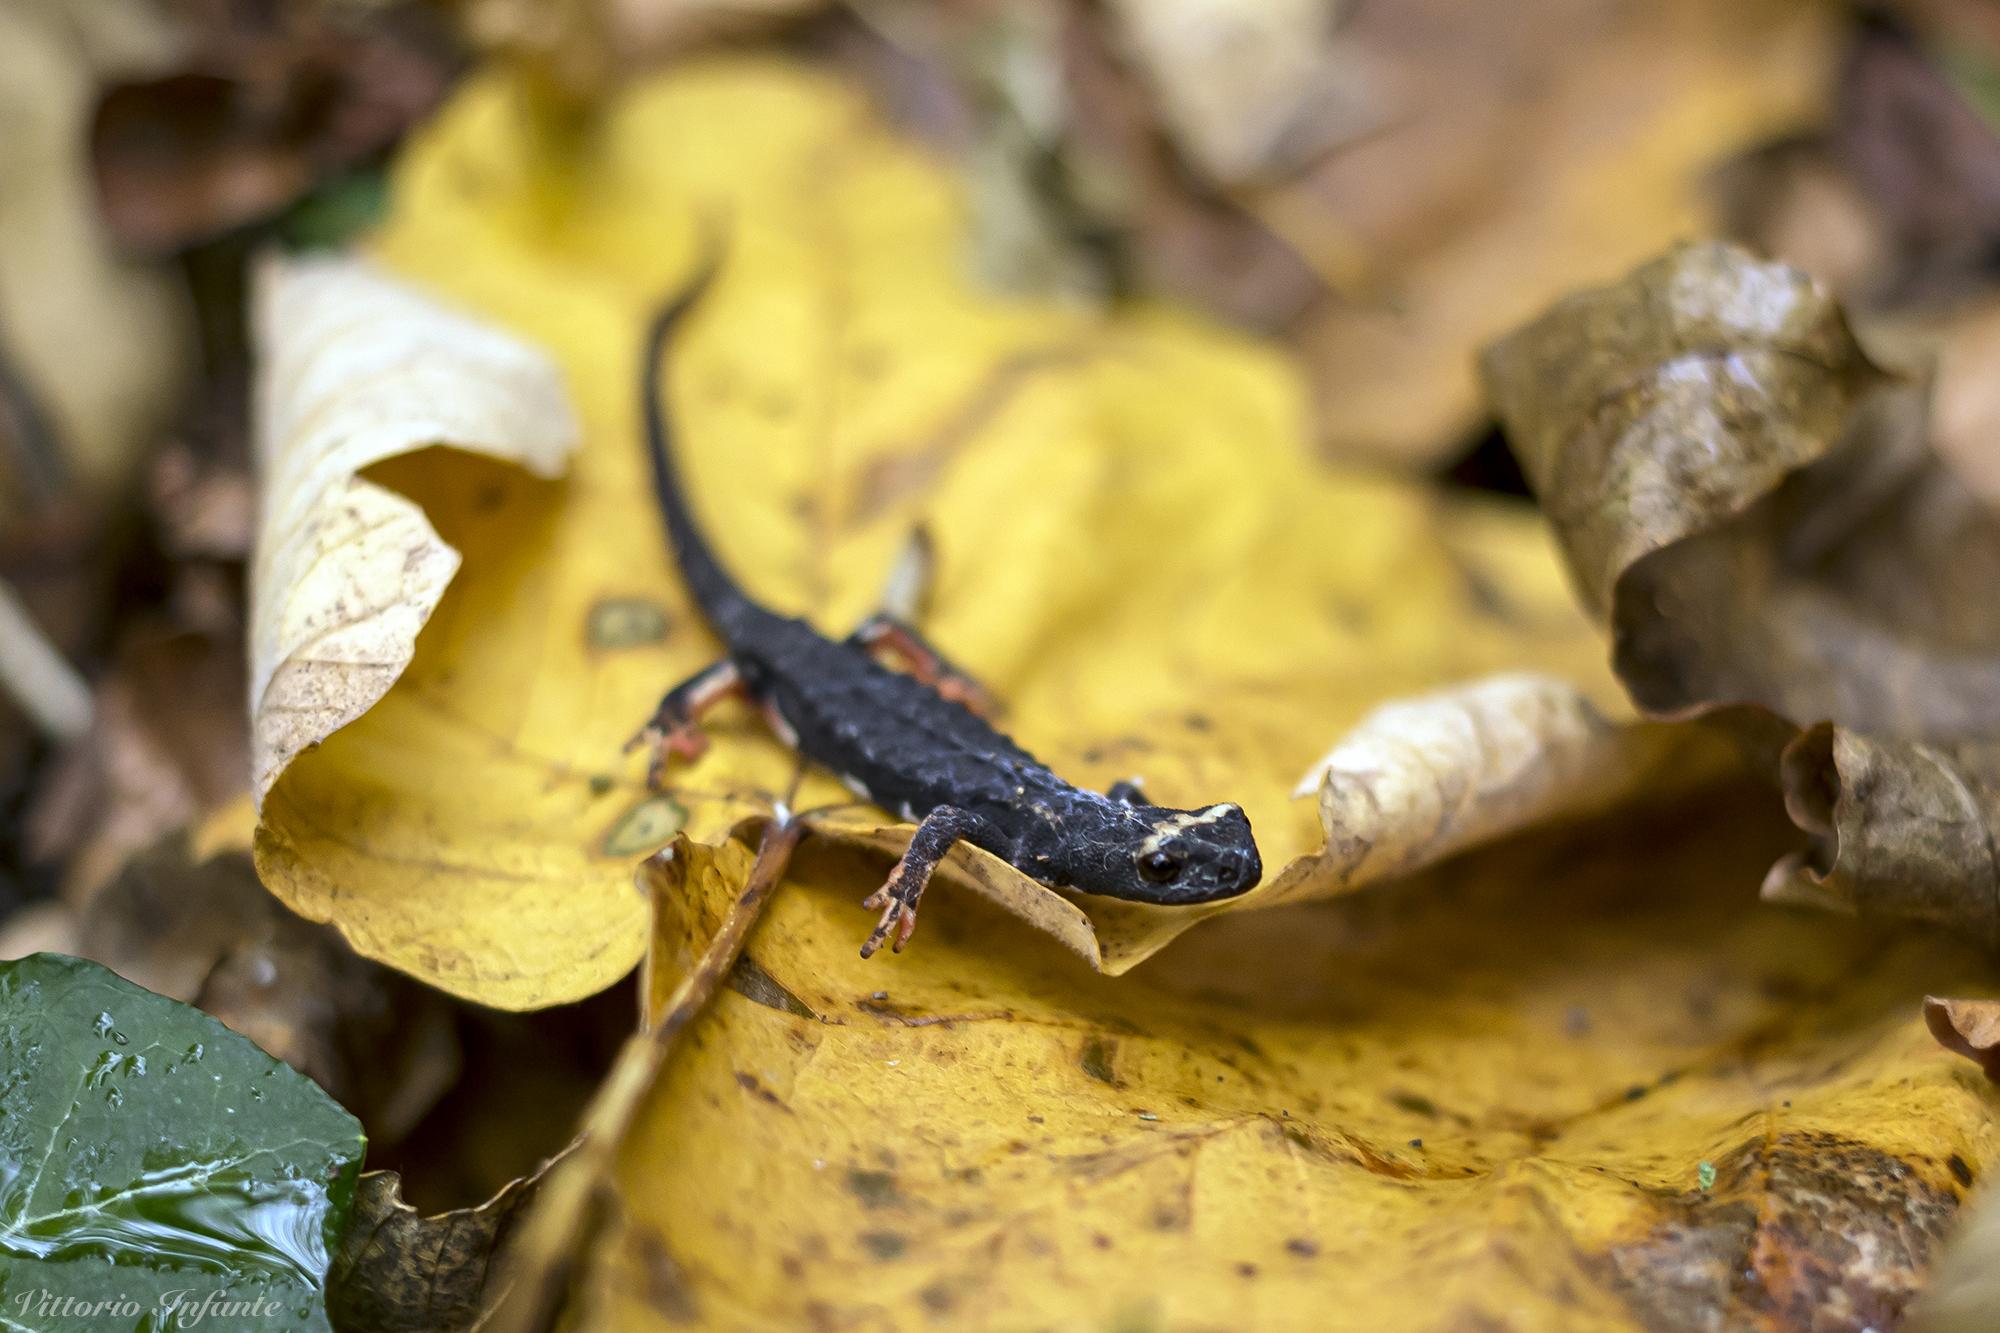 Salamandra dagli occhiali